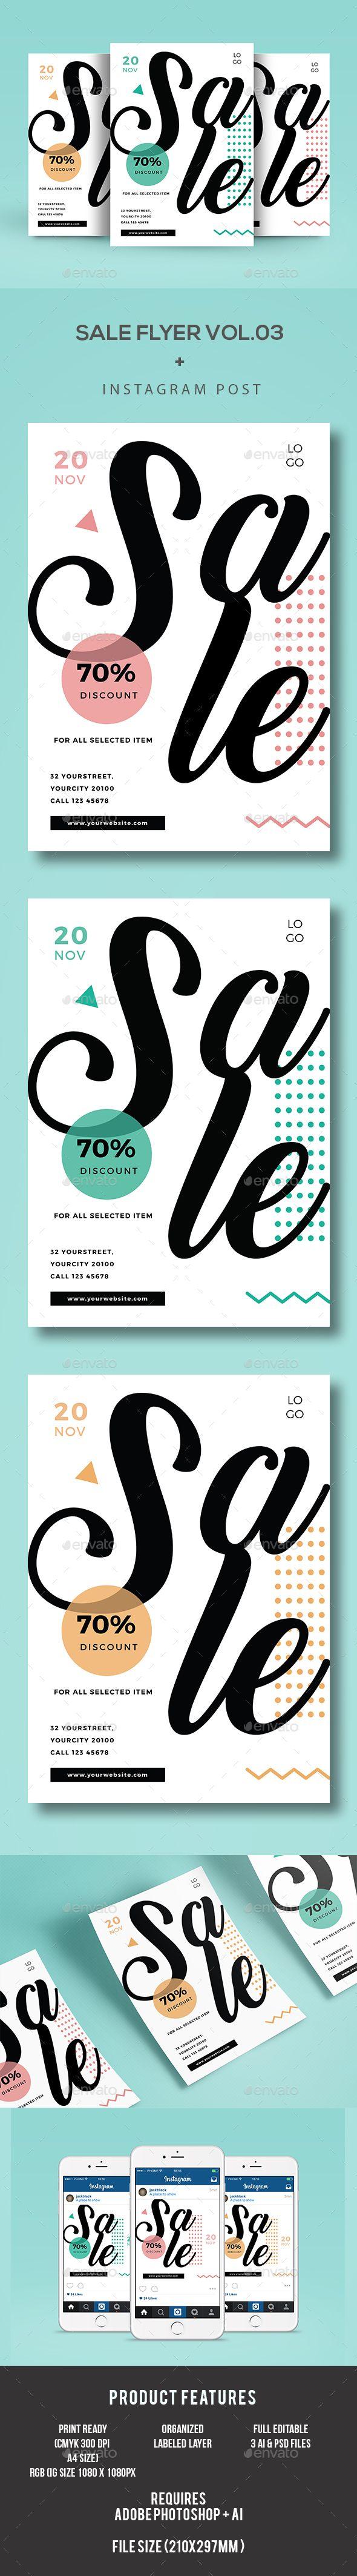 Sale Flyer  — PSD Template #winter sale #geometric • Download ➝ https://graphicriver.net/item/sale-flyer/18261860?ref=pxcr